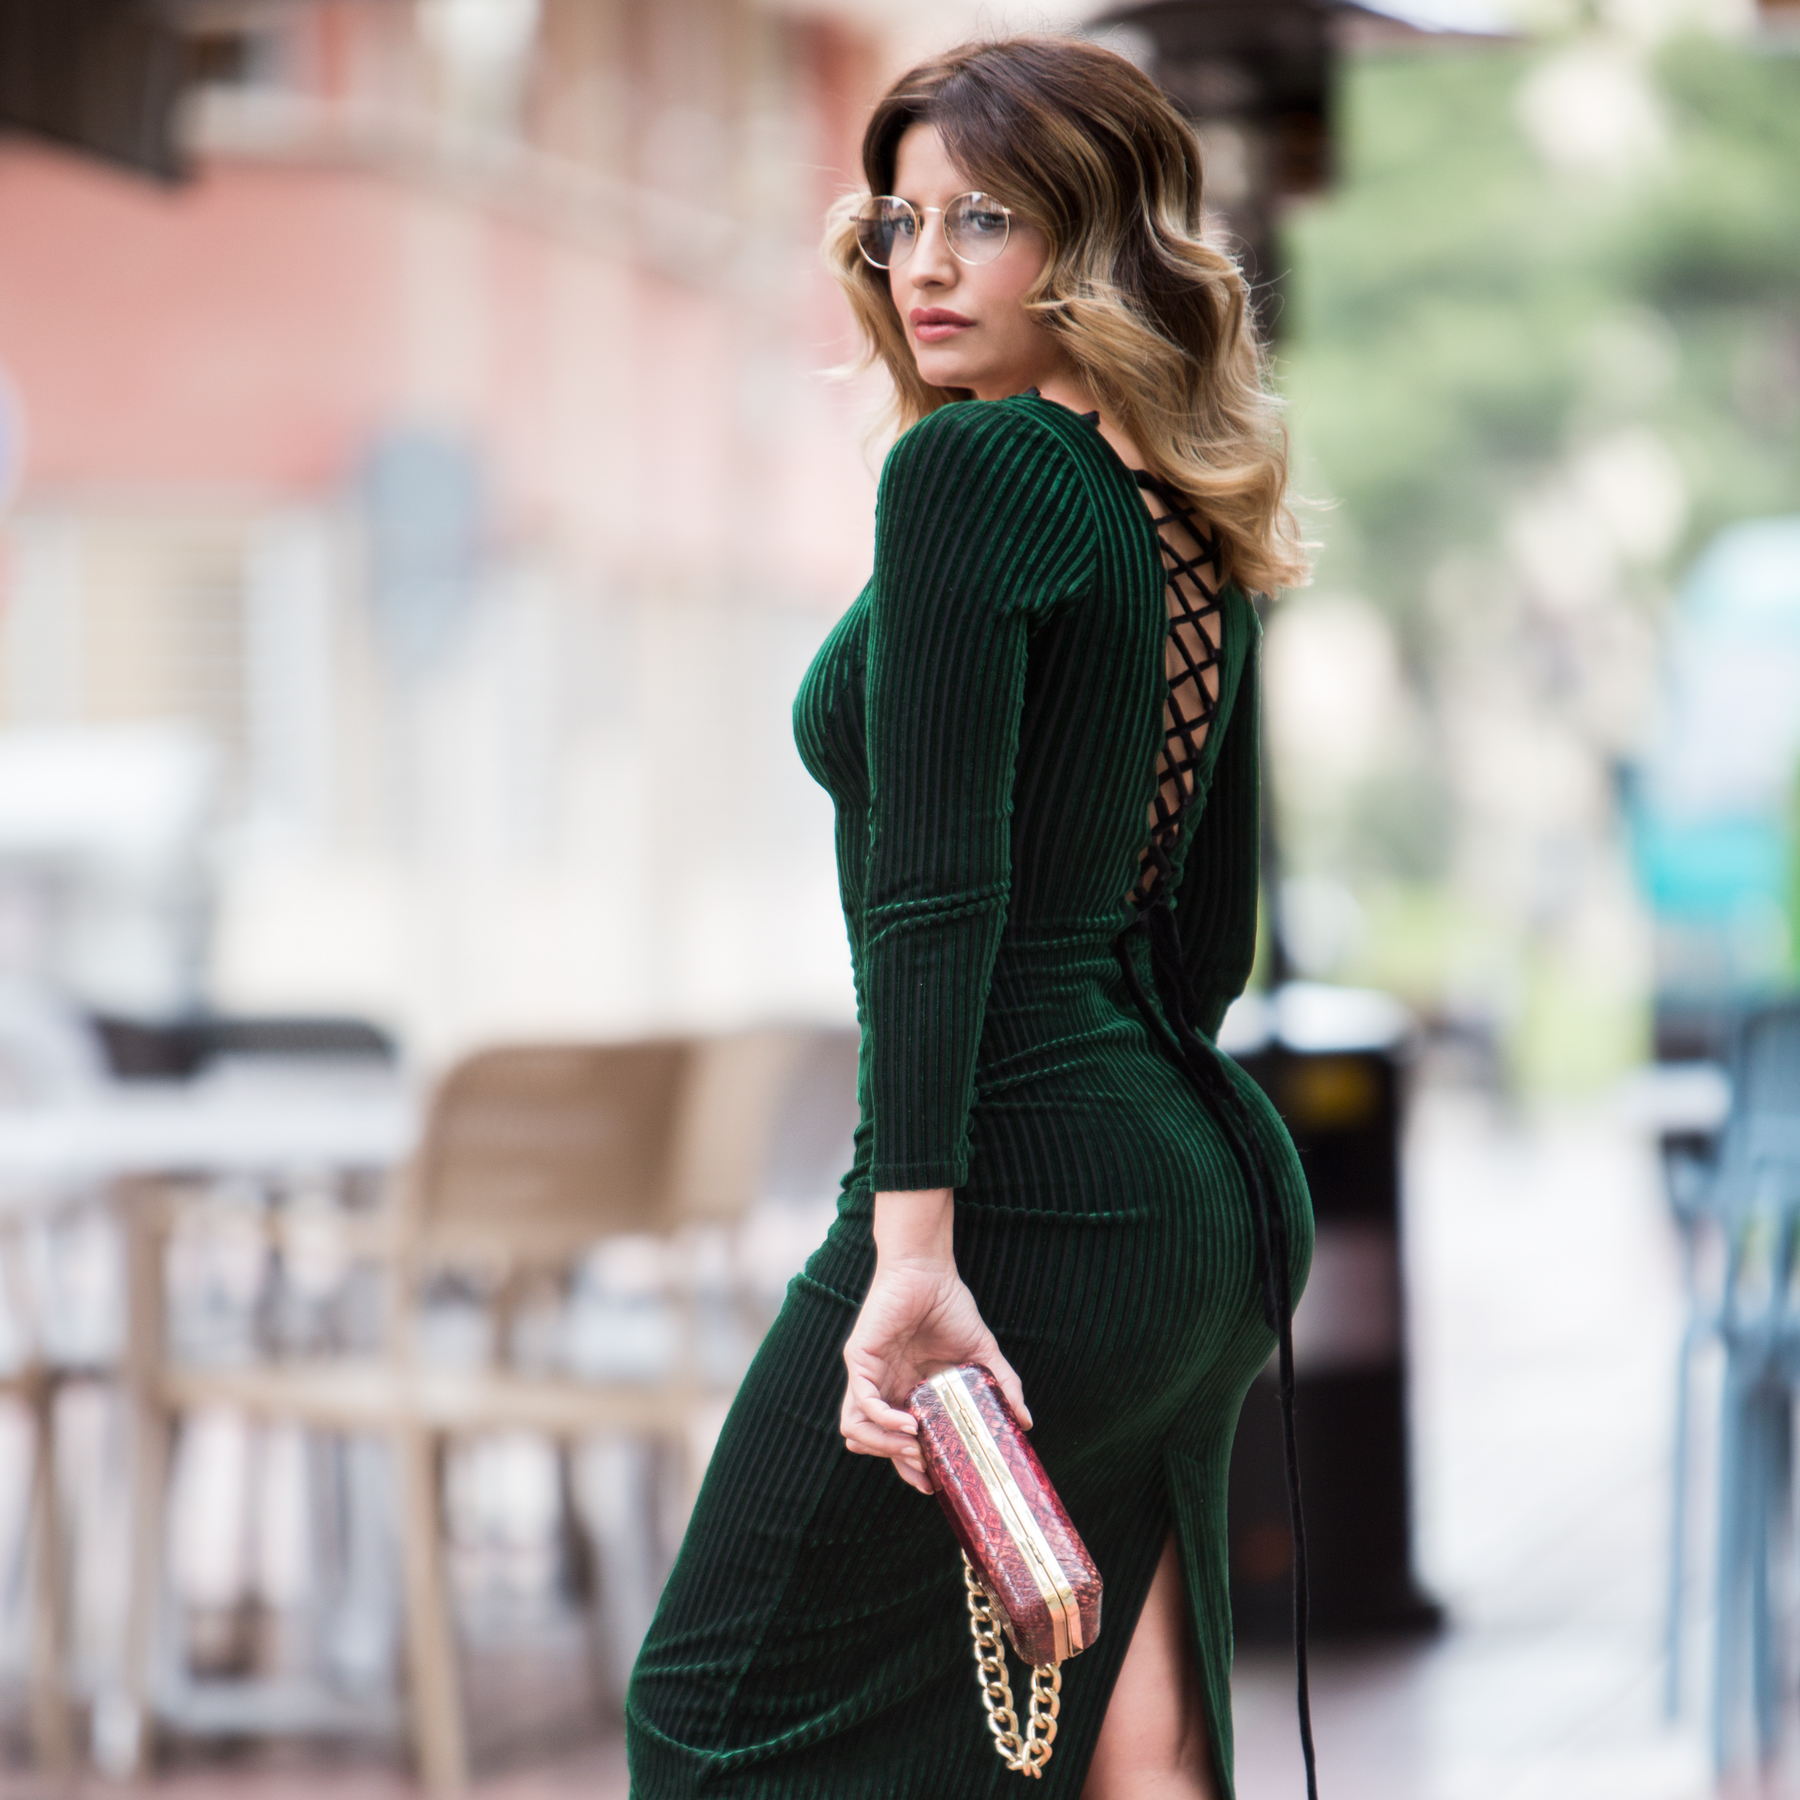 Vestidos verdes terciopelo